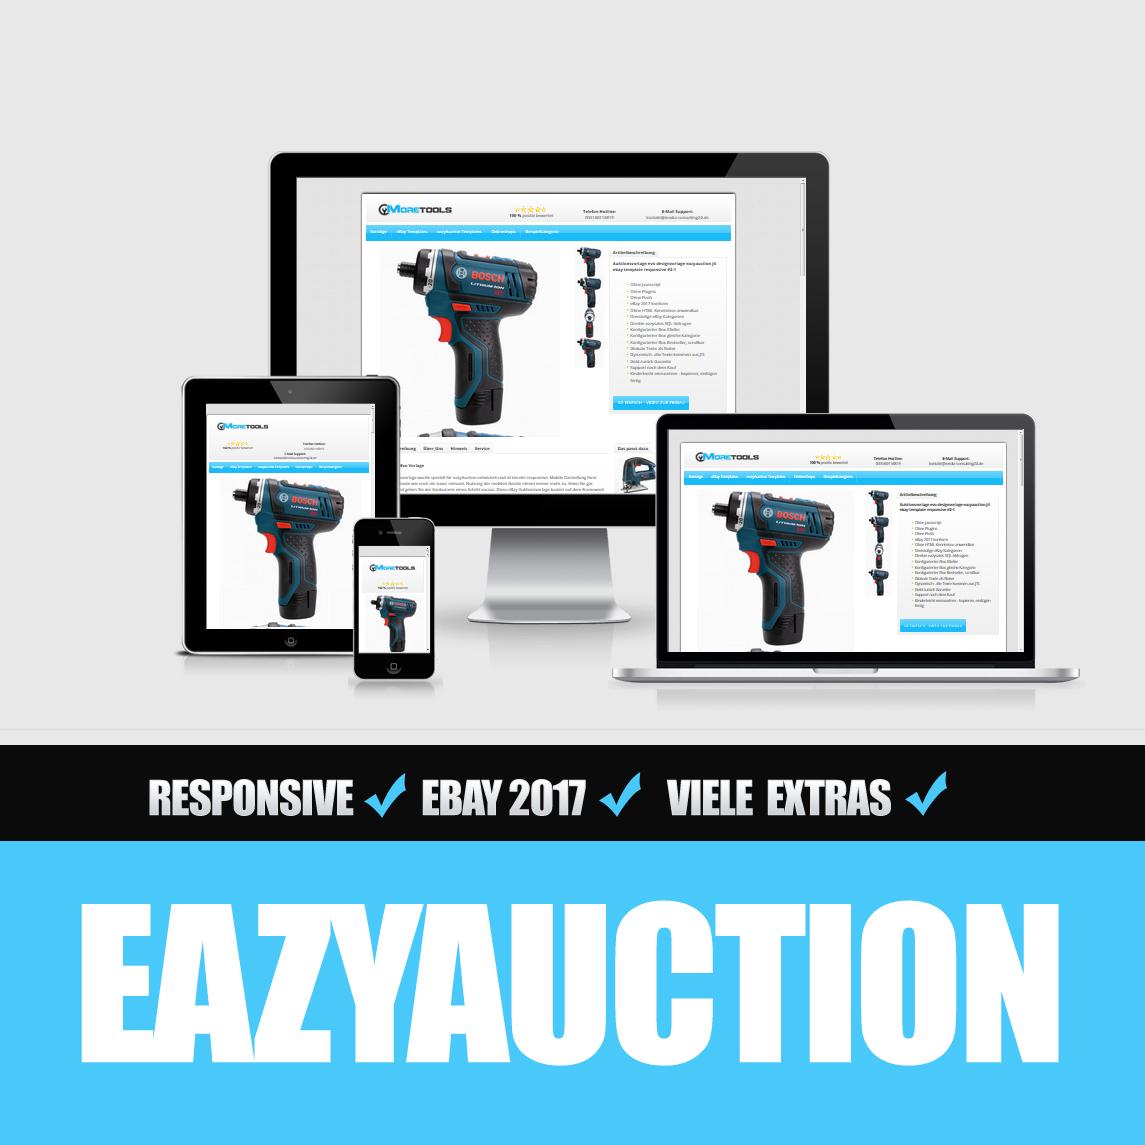 Eazyauction eBay Template 2017 #2-1